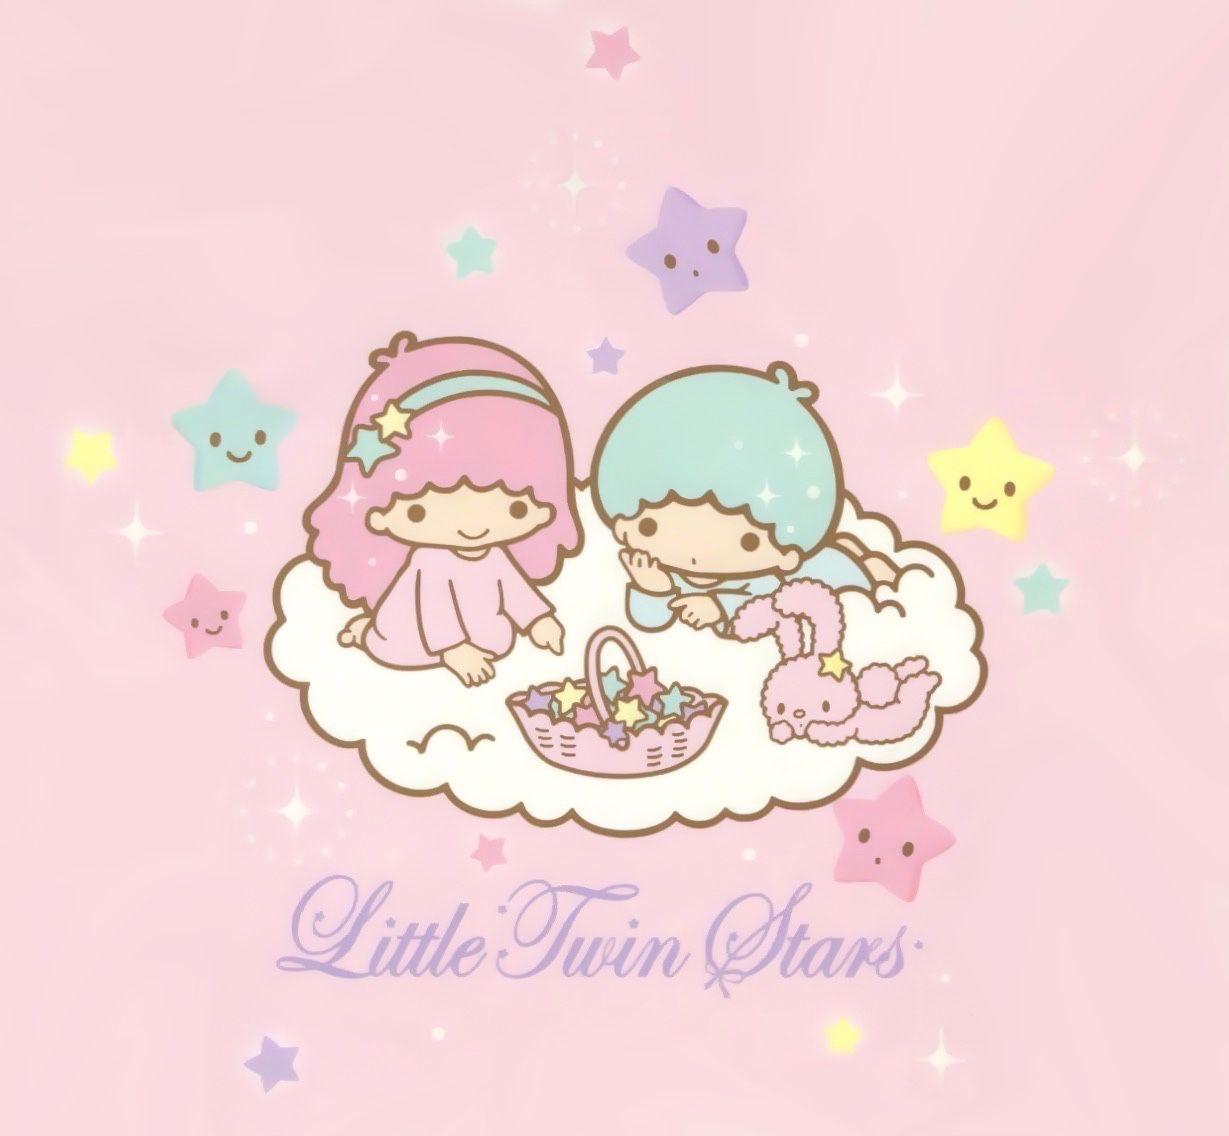 Little twin stars little twin stars pinterest manualidades bricolaje y manualidades y - Manualidades y bricolaje ...